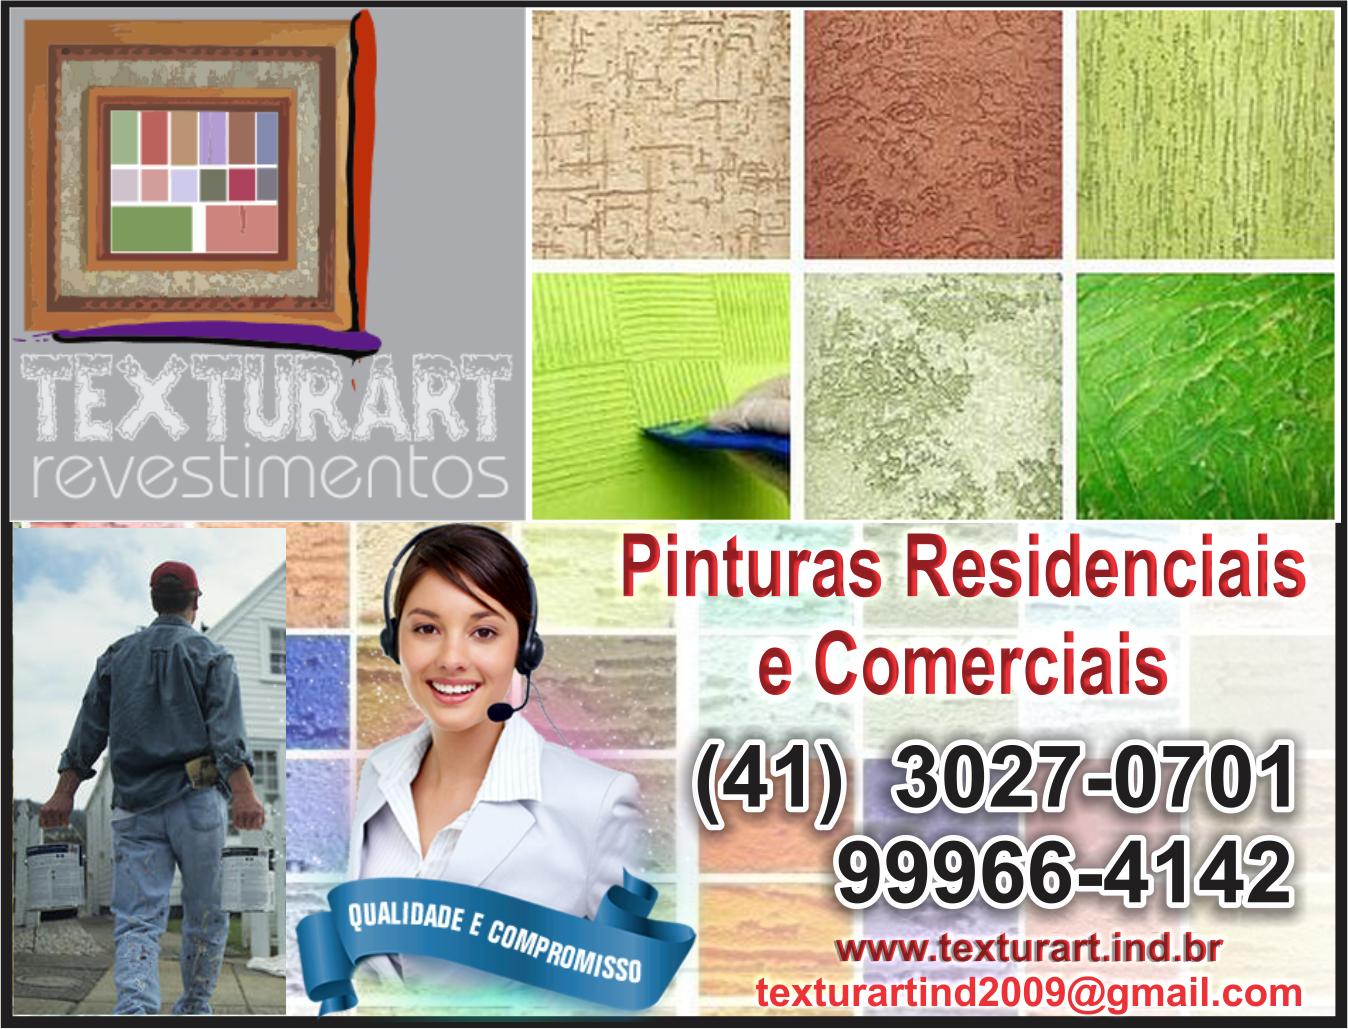 Texturart Revestimentos - (41) 3027-0702 / (41) 99966-4142